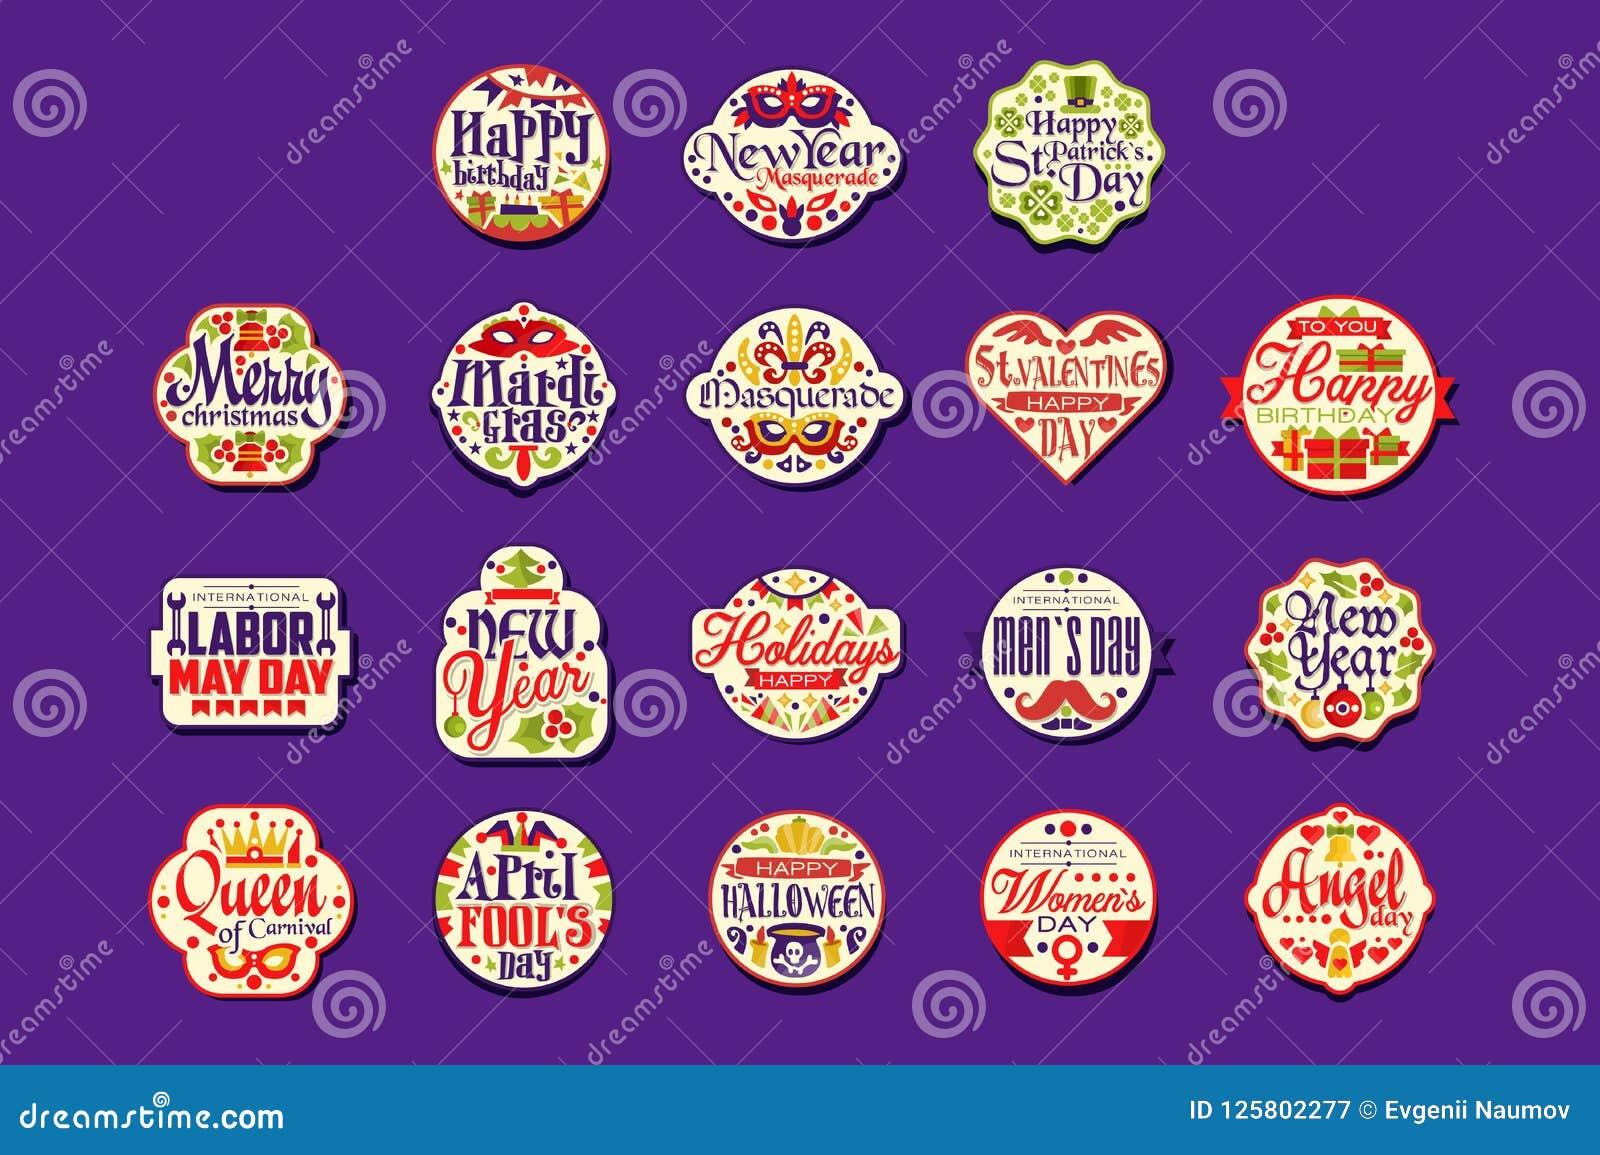 Colorful Logo Or Label Set For Holiday Retro Design Festive